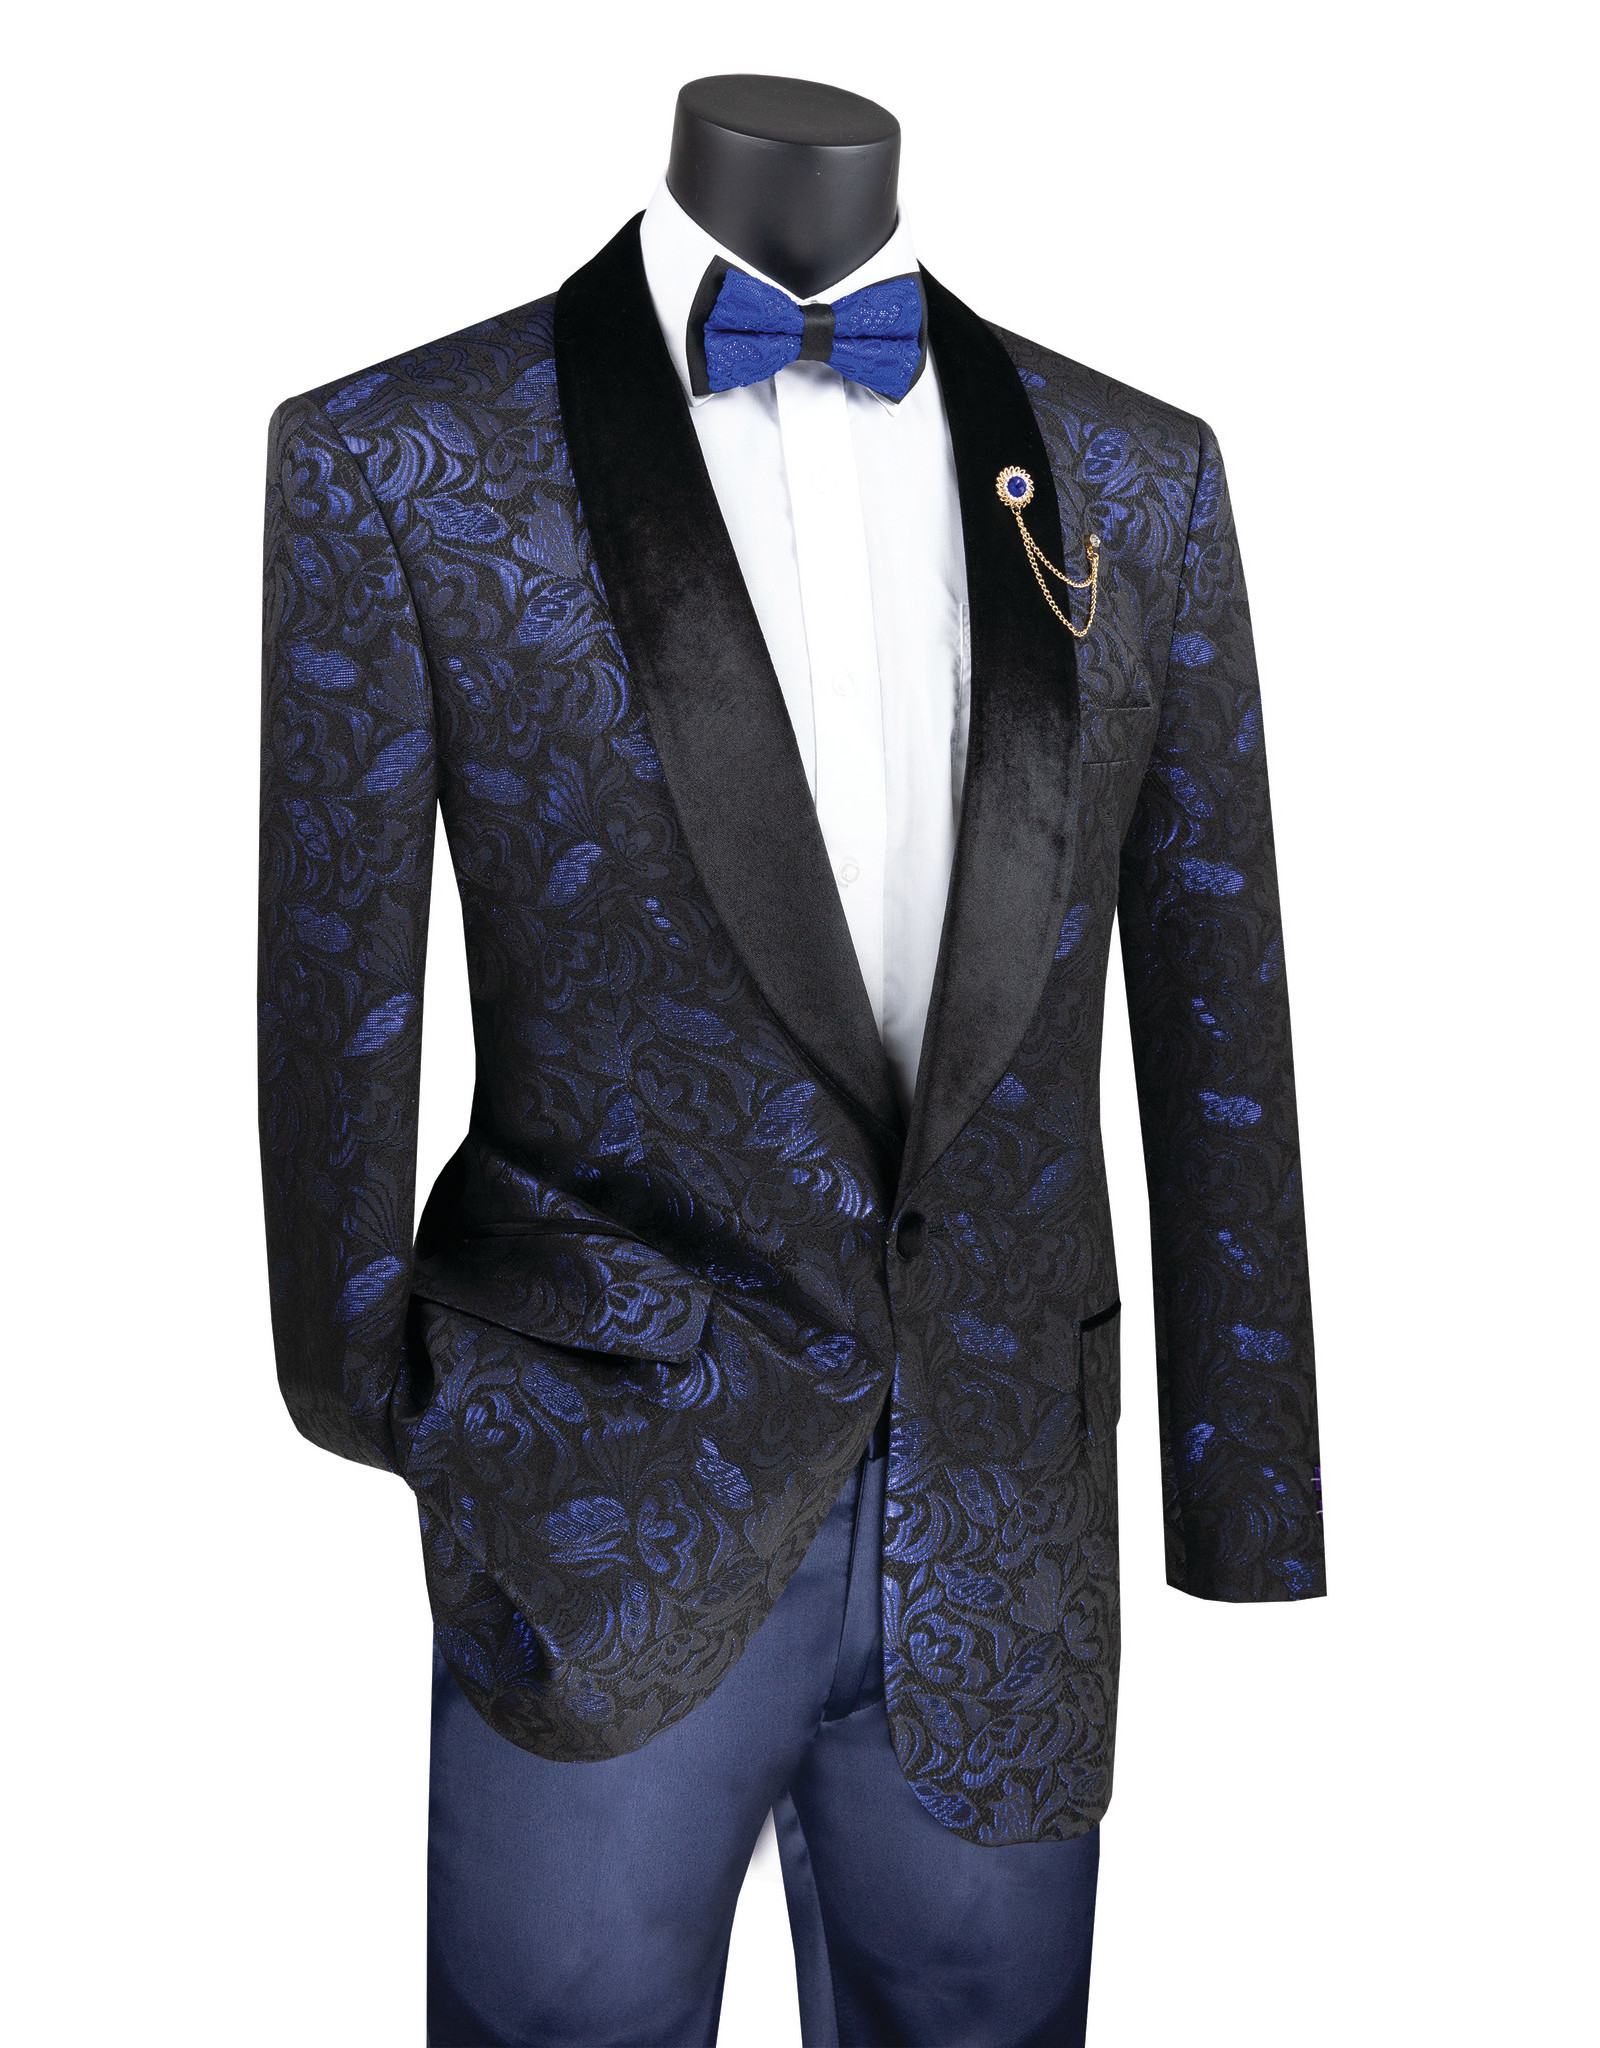 Vinci Vinci Slim Fit Blazer - BF1 Sapphire Blue